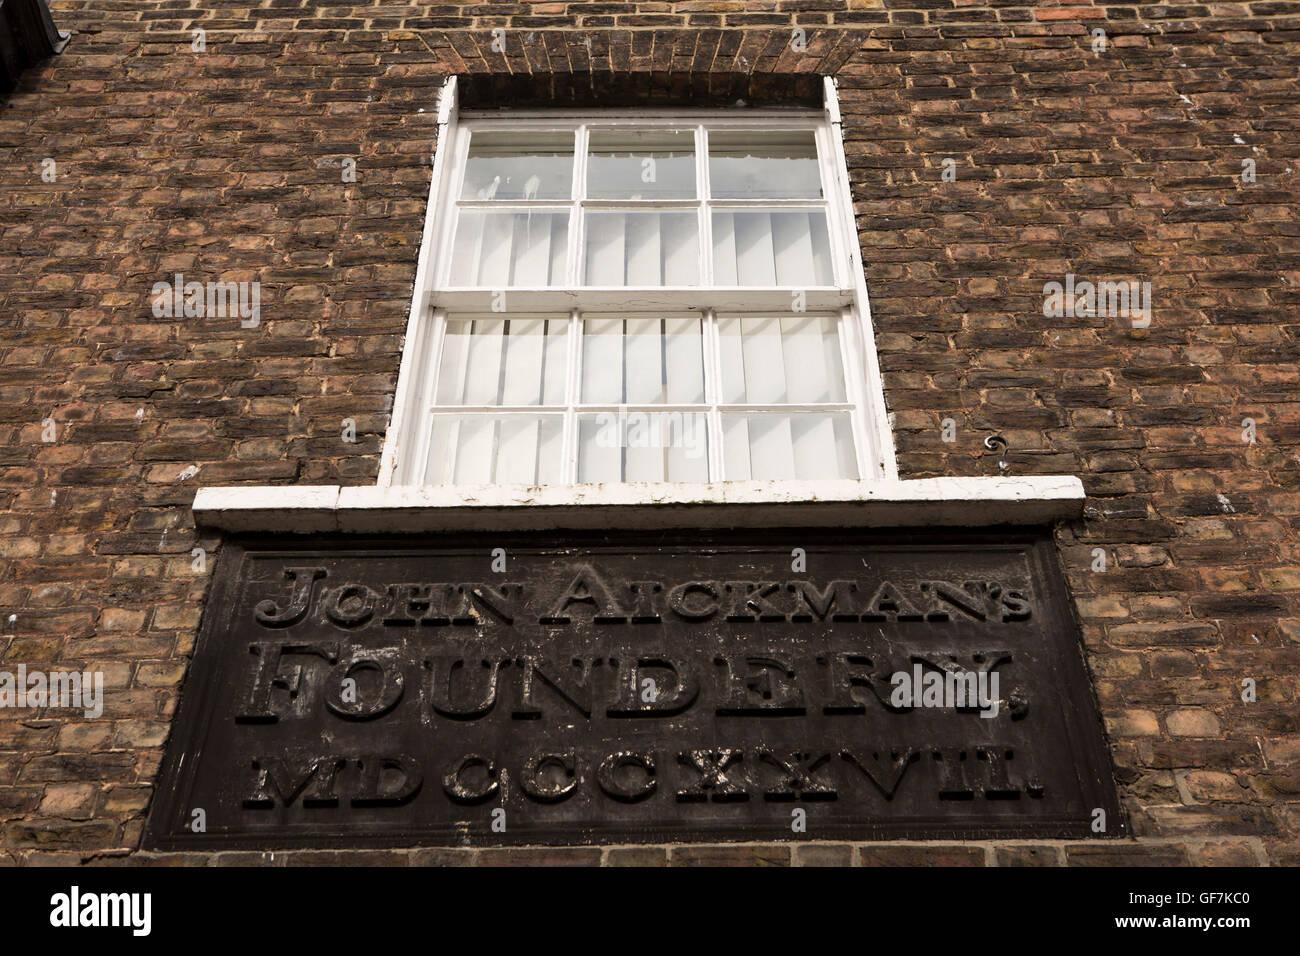 UK, England, Norfolk, King's Lynn, King Street, John Aickman's Foundry (Foundery) 1827 cast iron sign, Linnock Yard Stock Photo